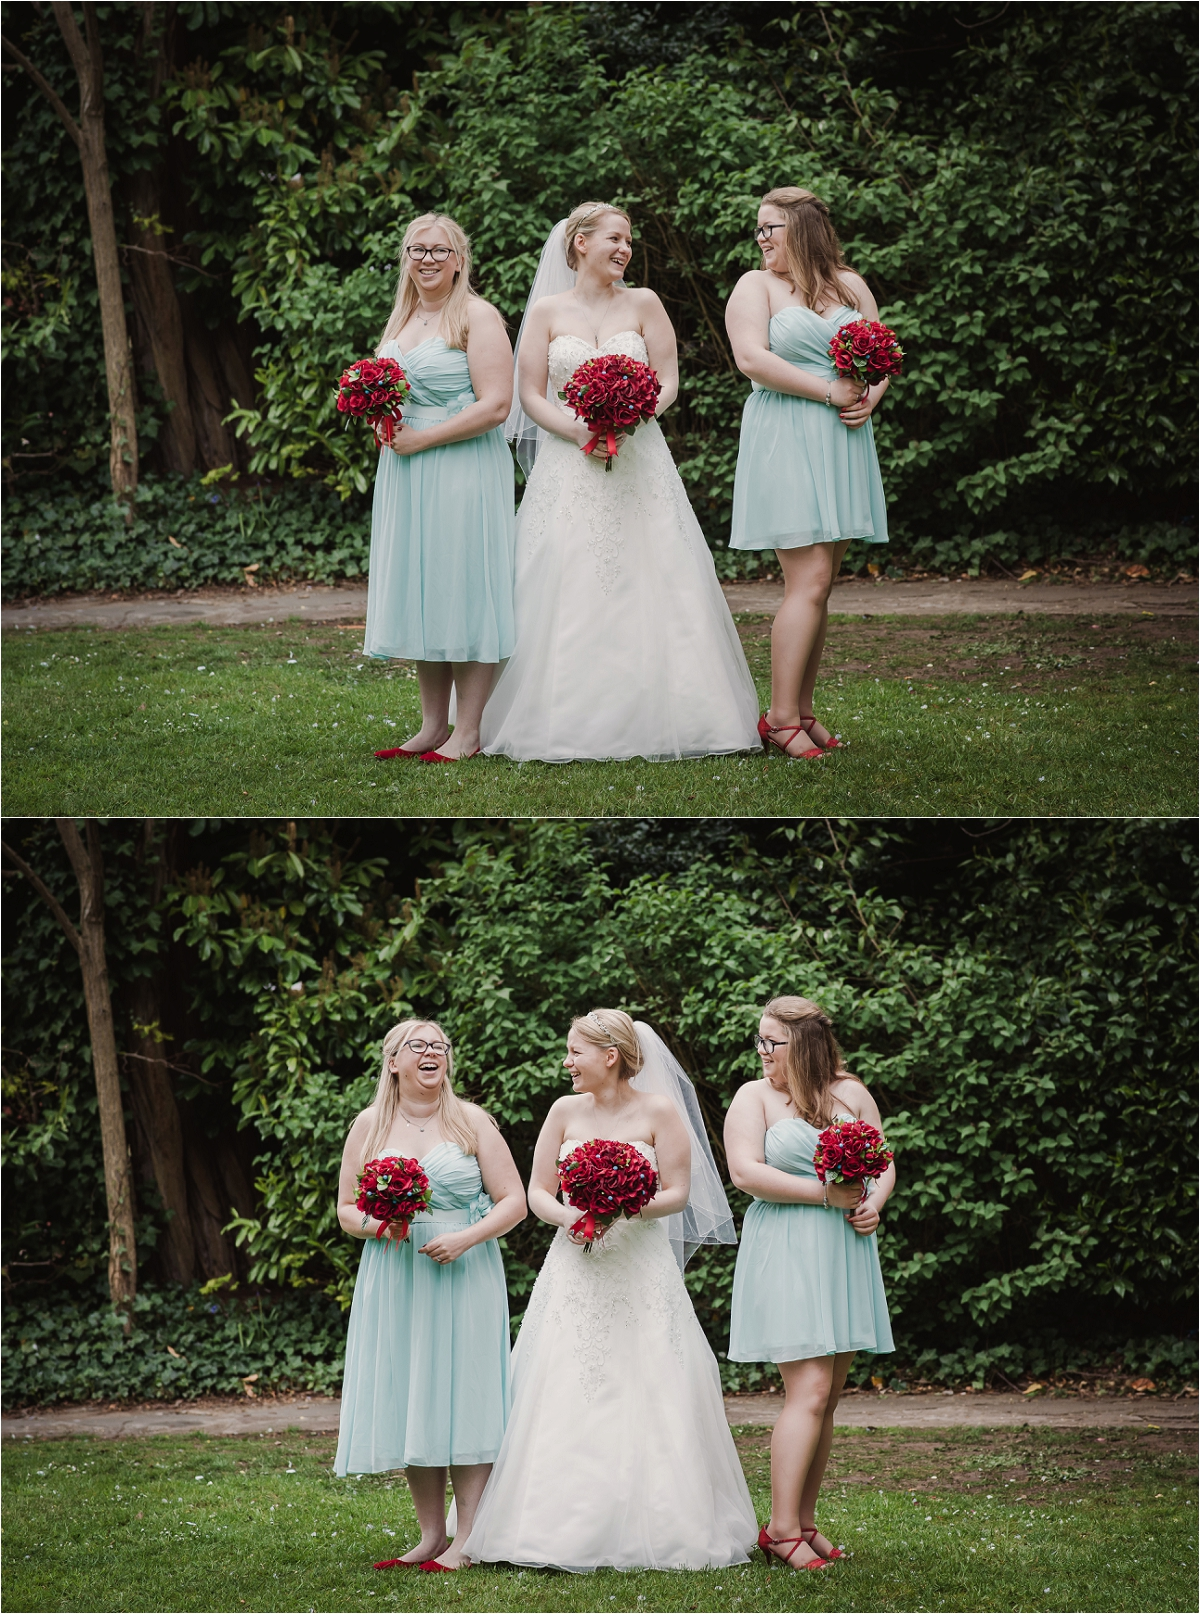 dan_emma_wedding_0060.jpg